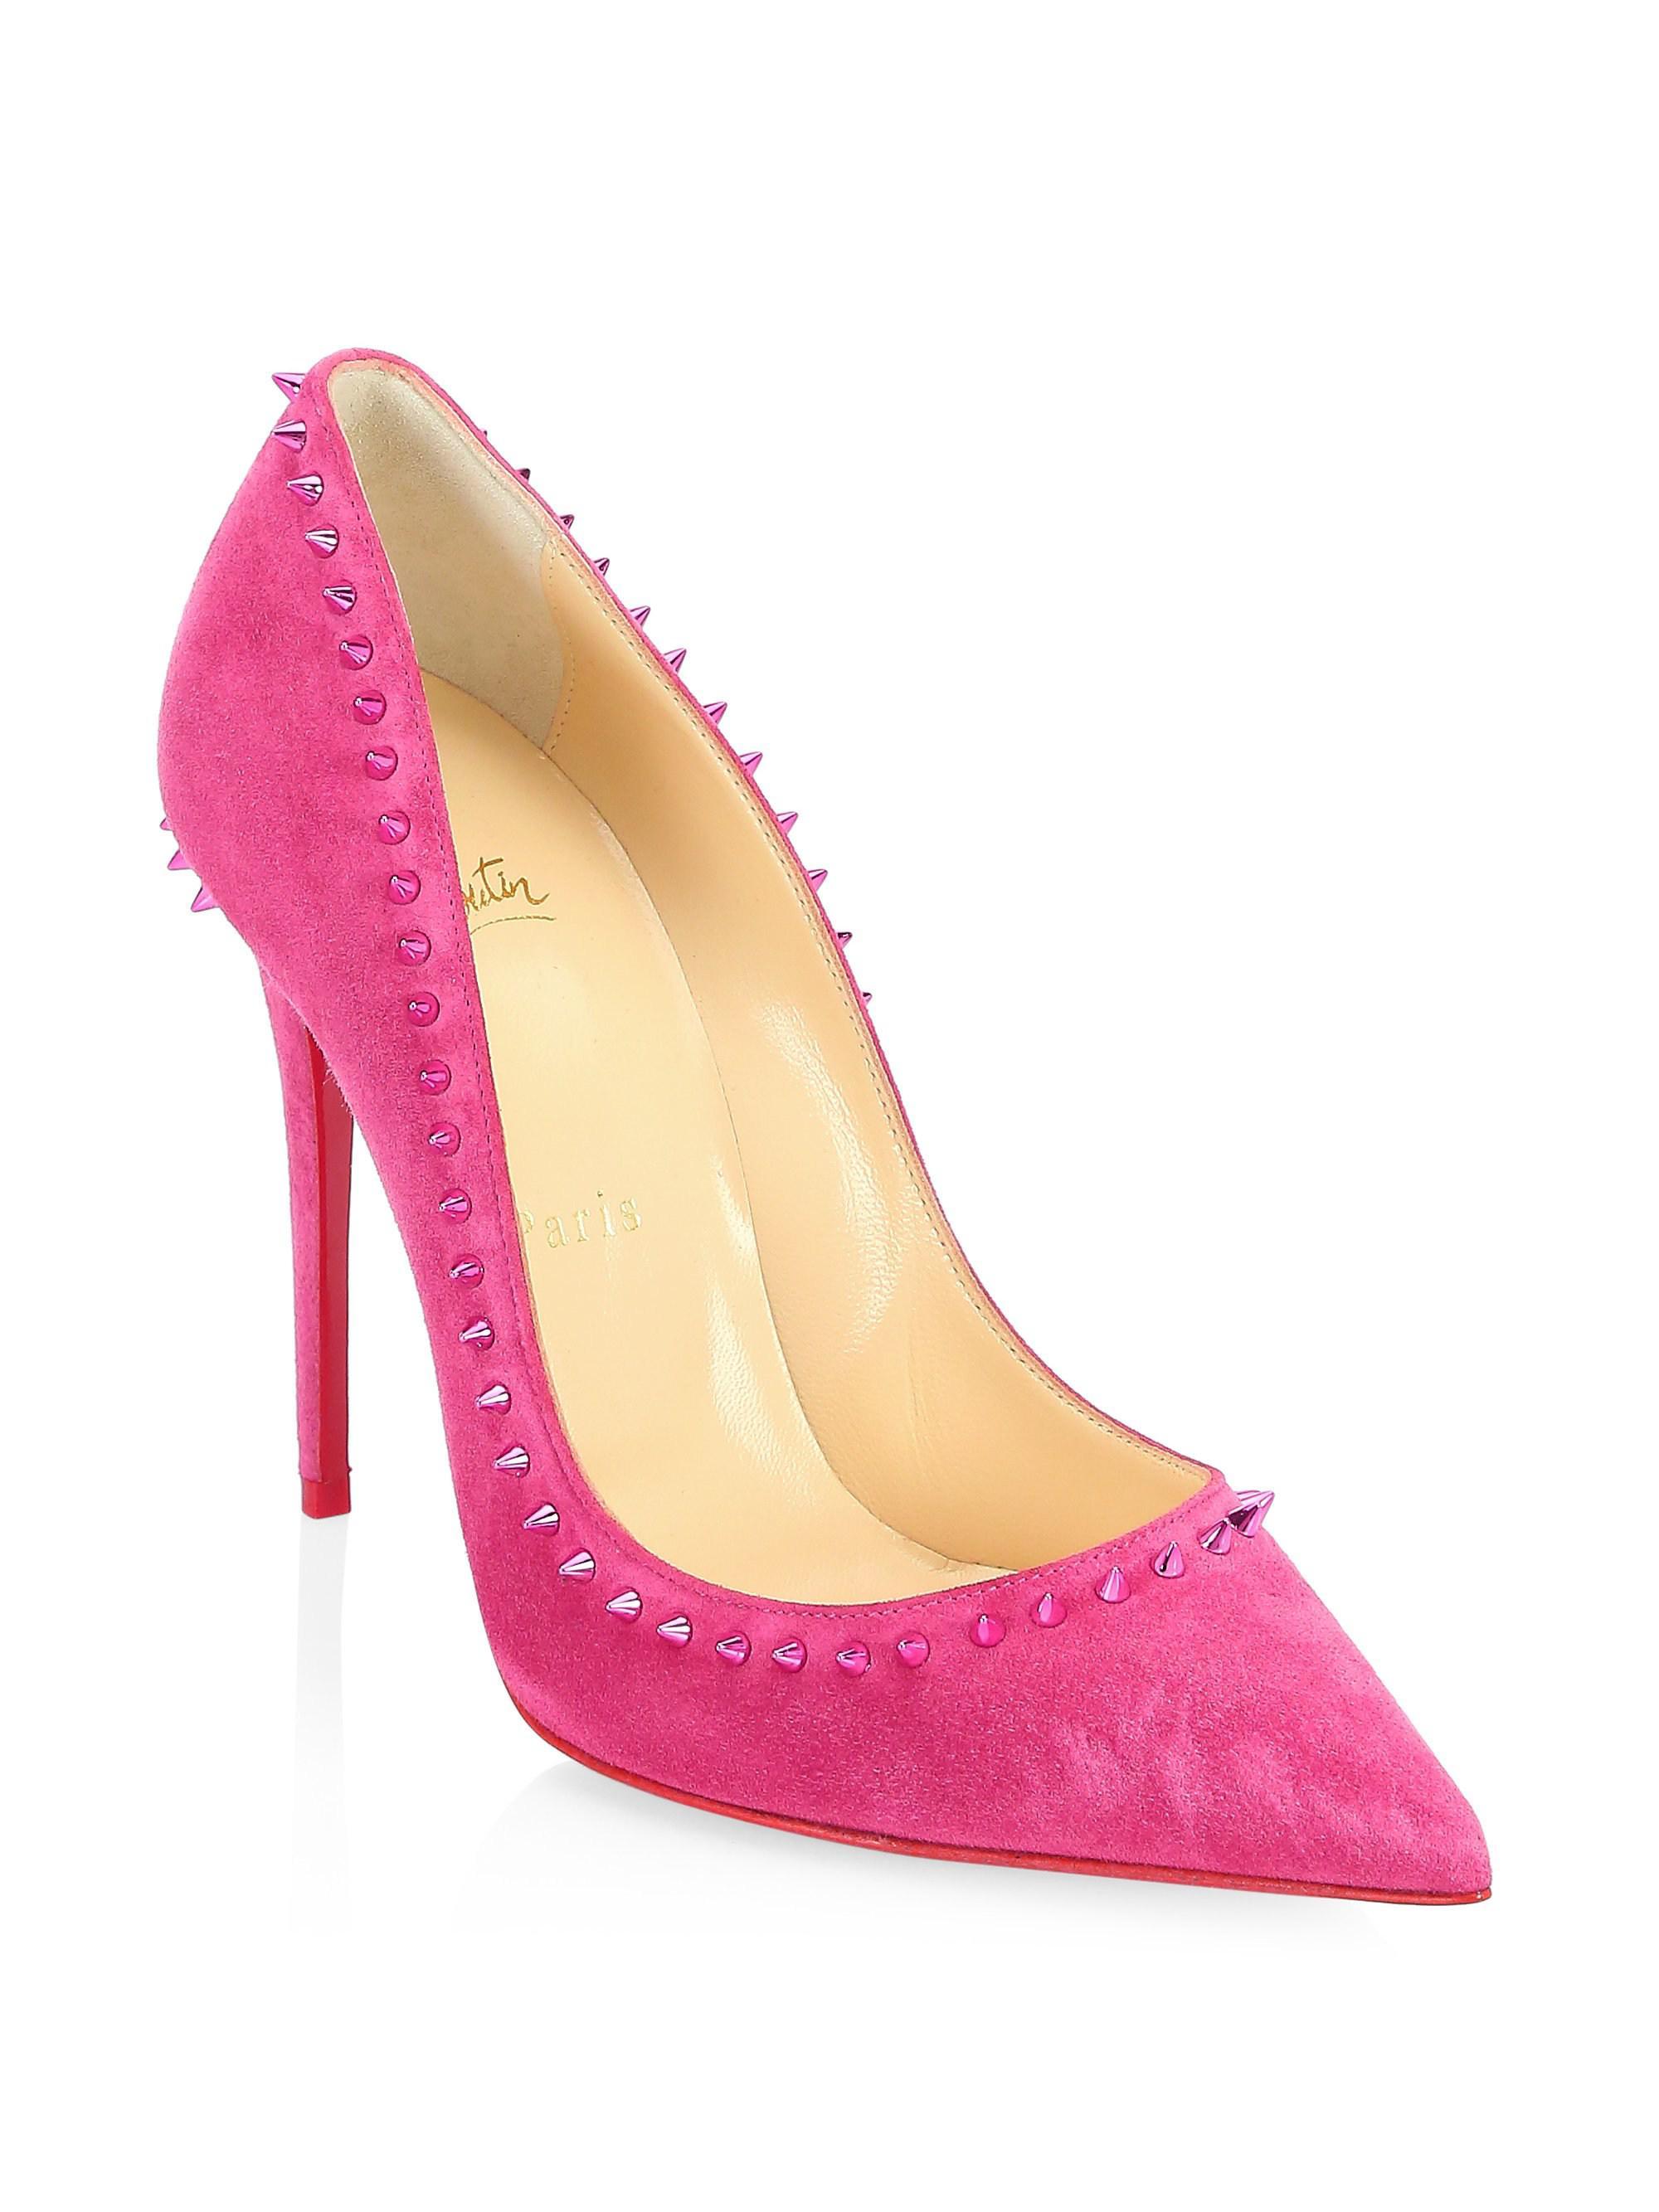 newest d889d d08a5 Christian Louboutin Pink Anjalina 100 Studded Suede Pumps